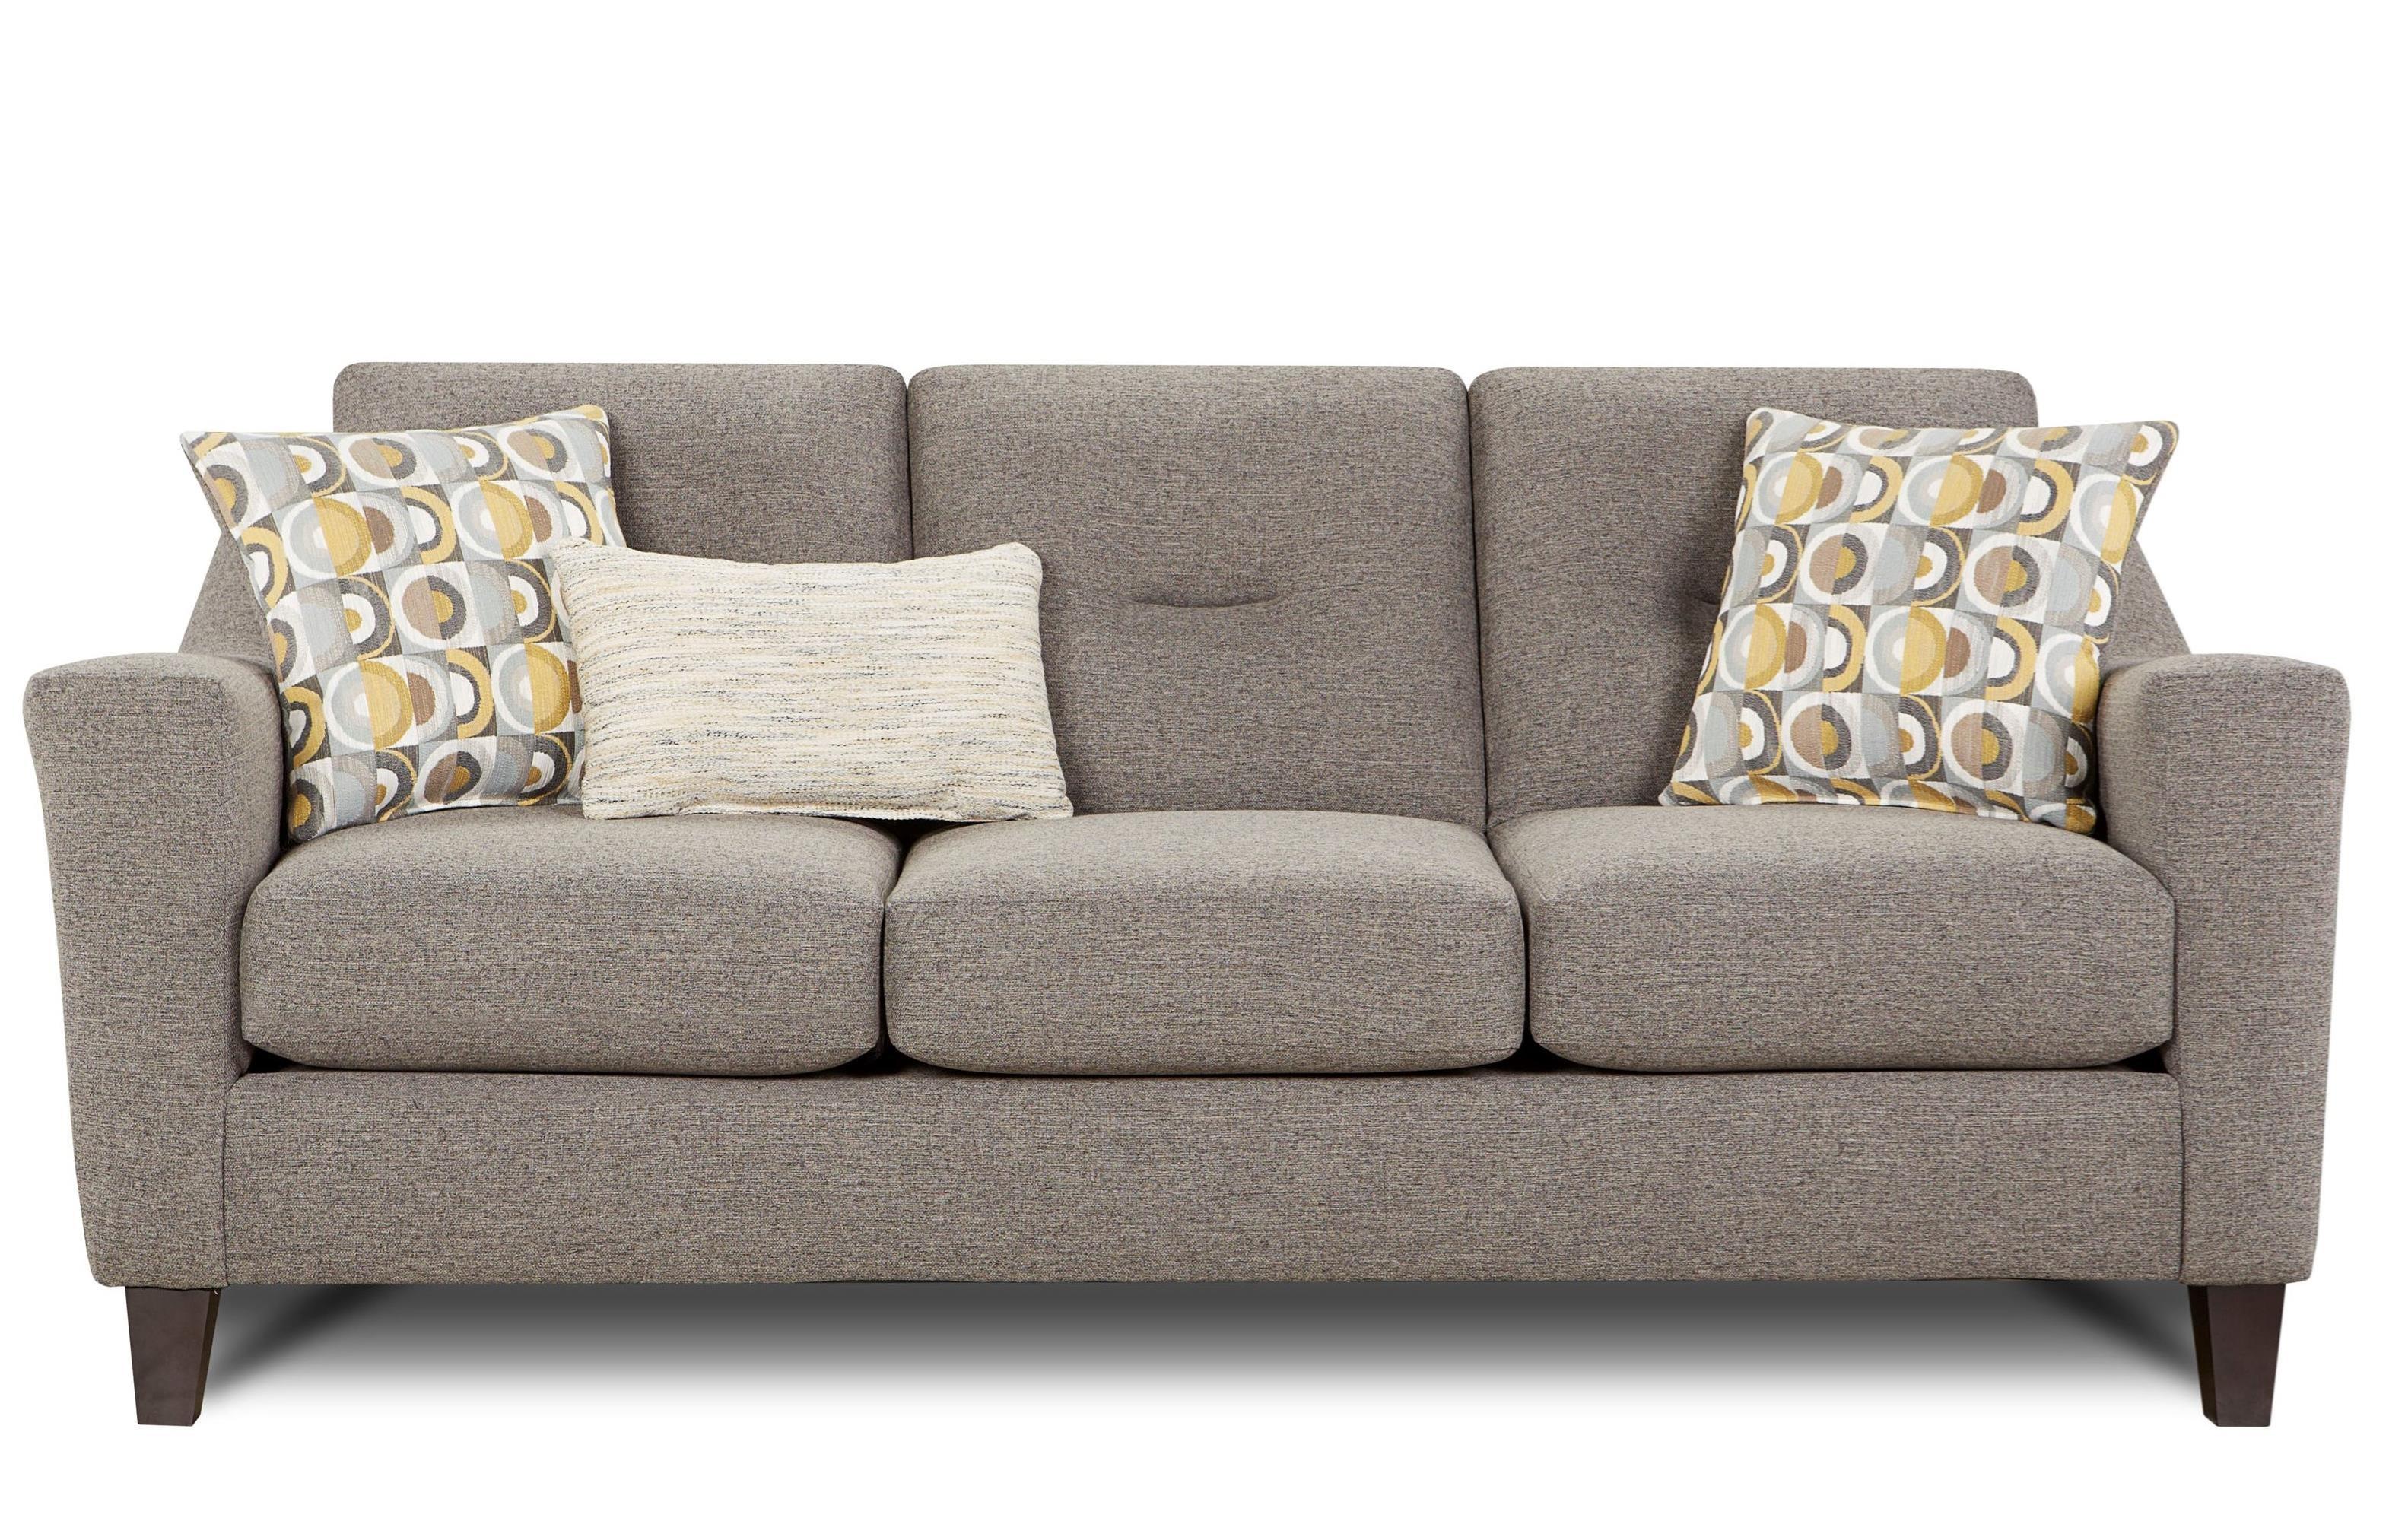 8210 Contemporary Sofa By Haley Jordan